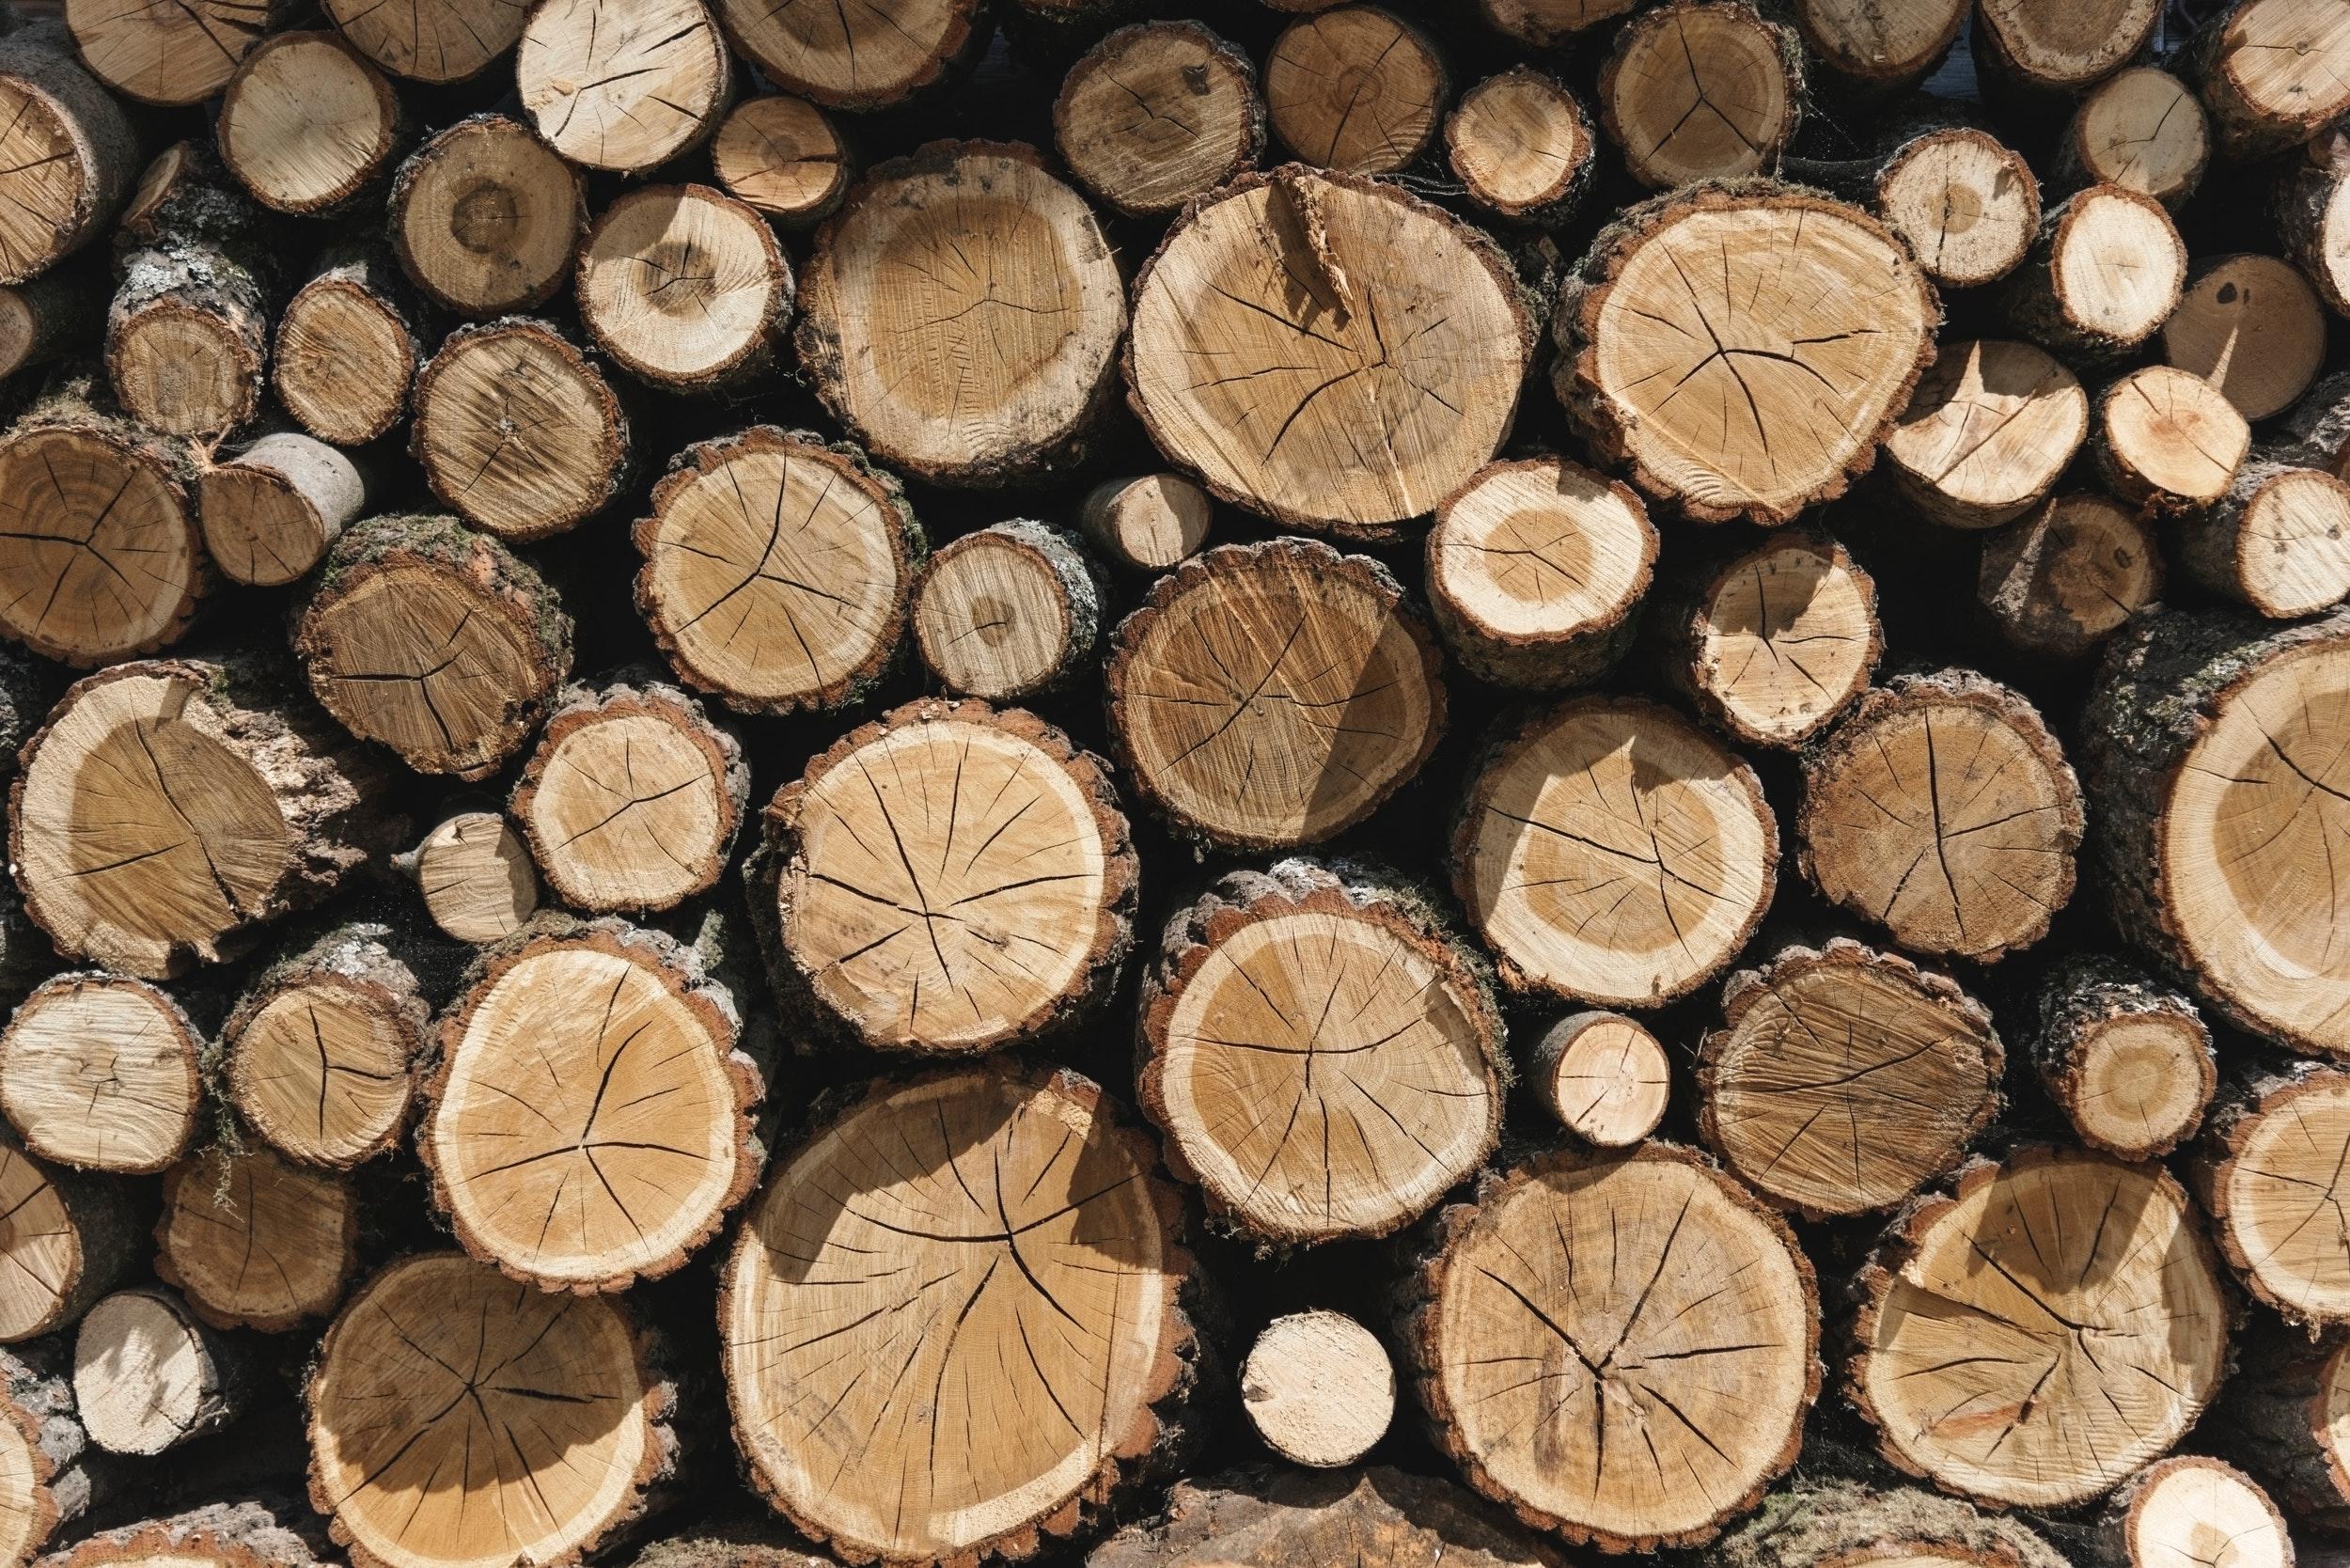 chopped-chopped-wood-cut-935866